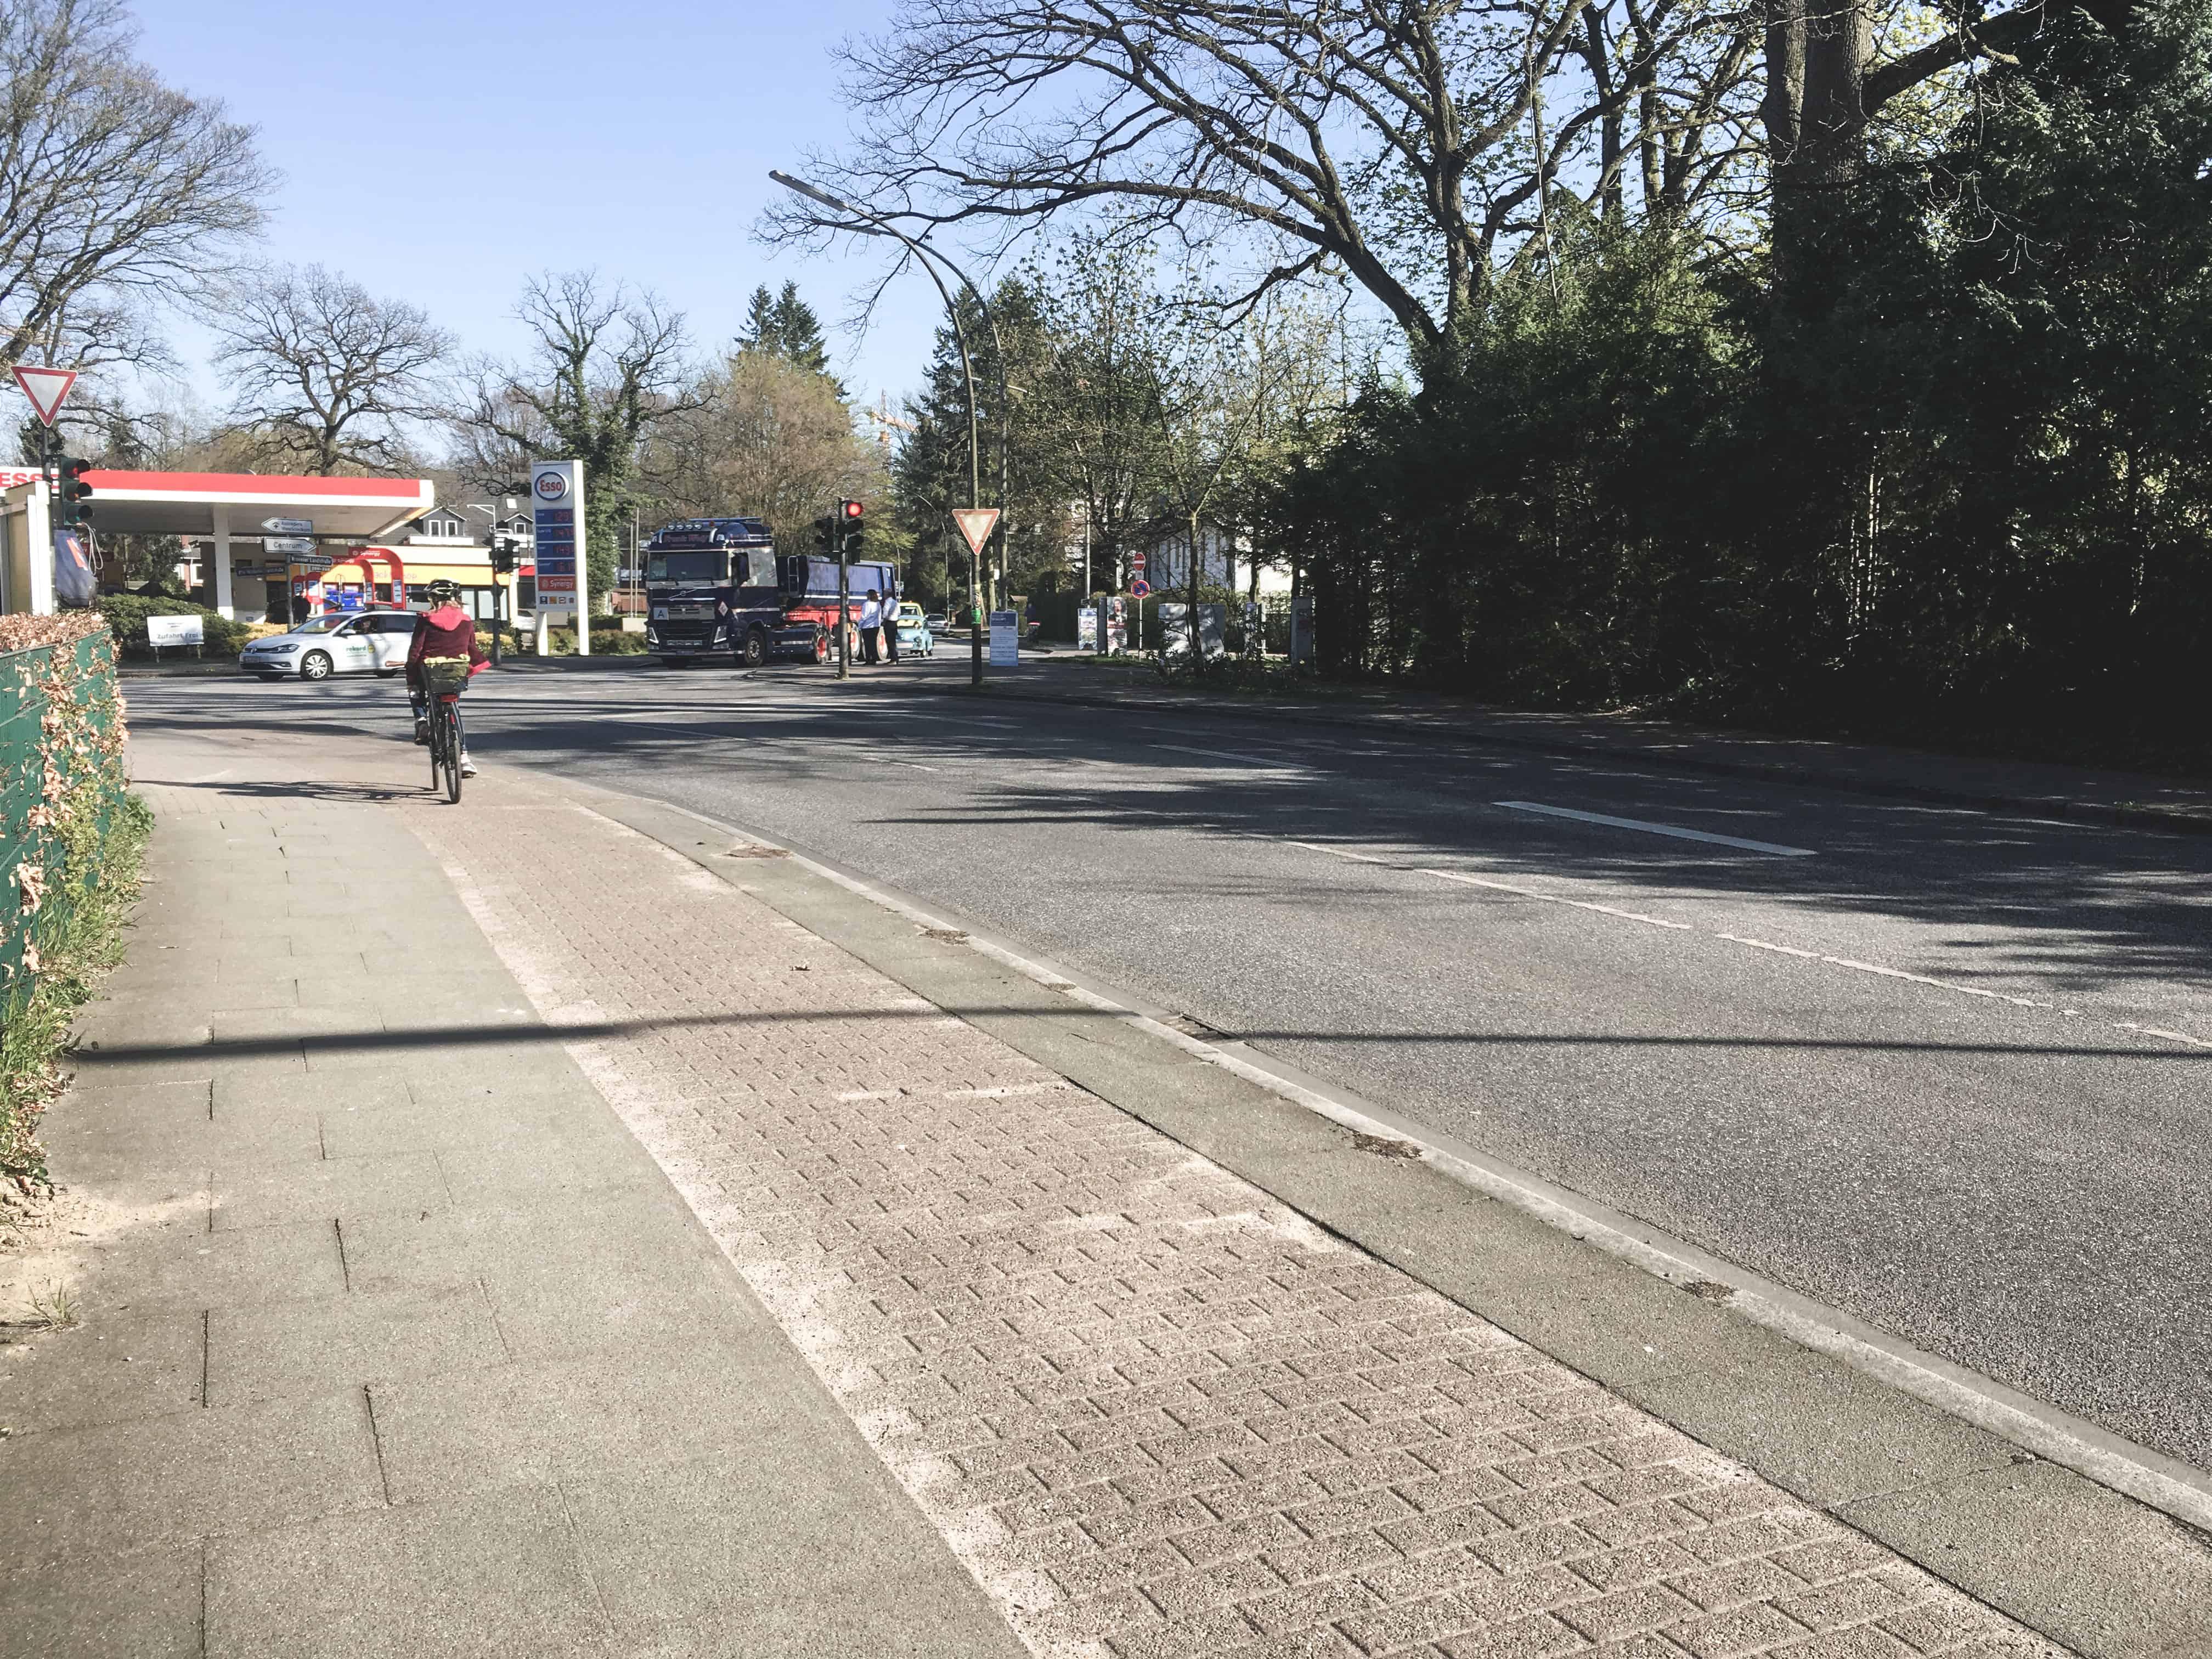 Bike lane in Germany